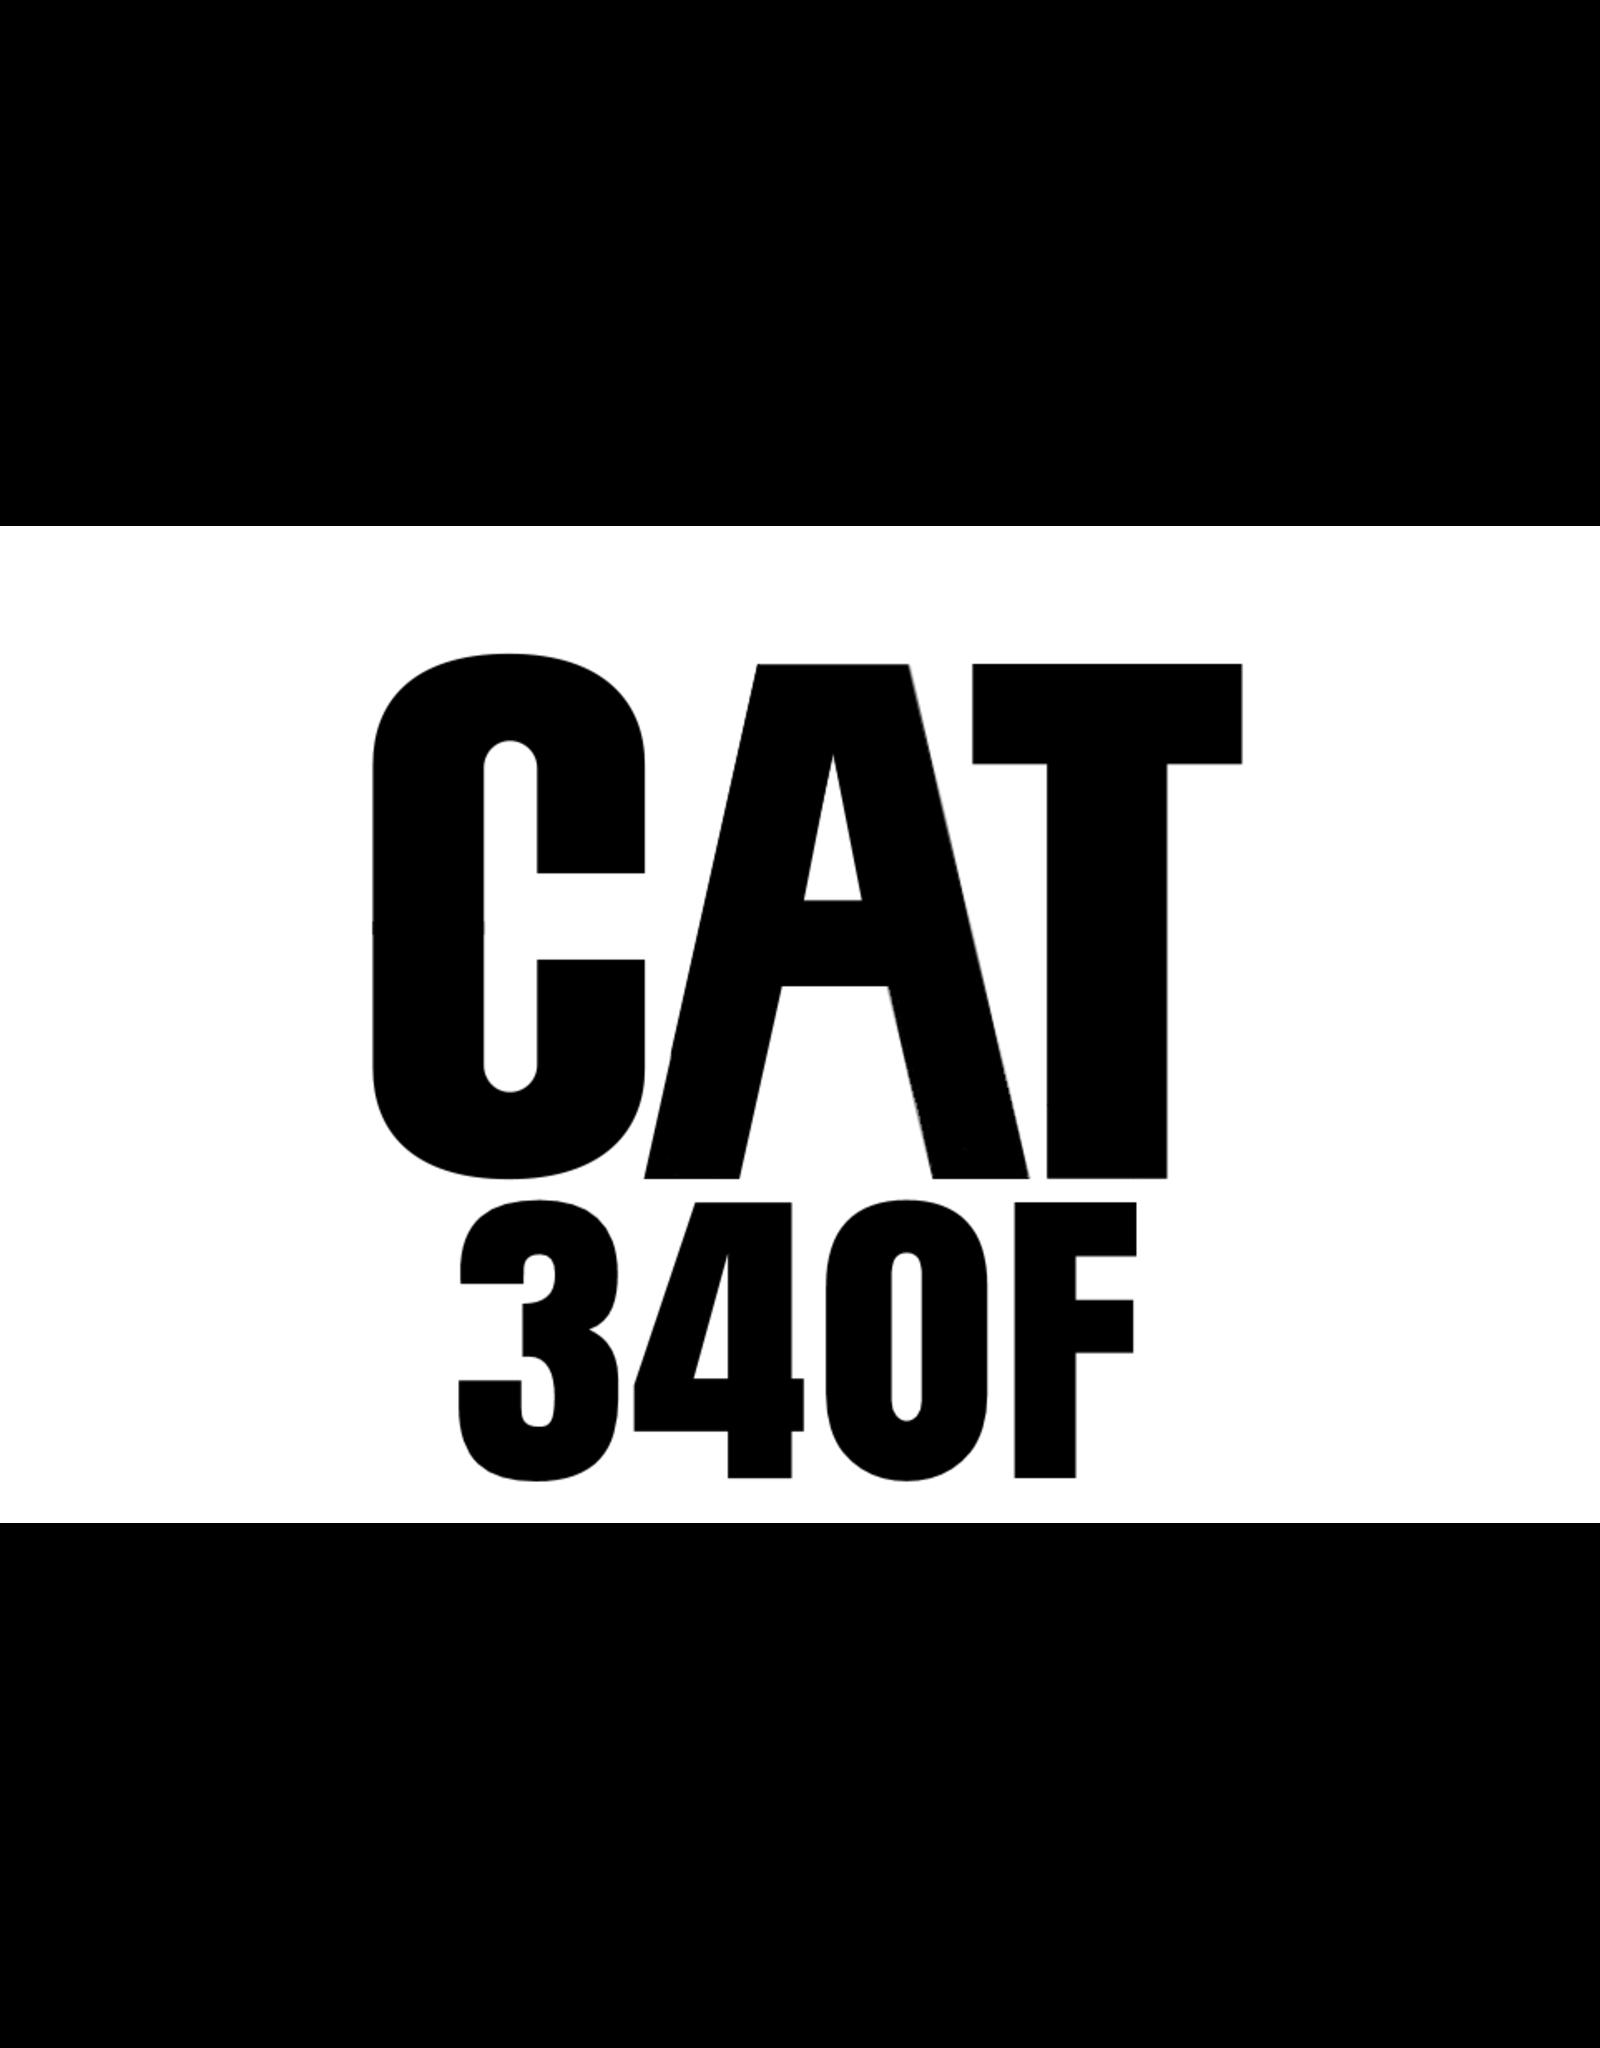 Echle Hartstahl GmbH FOPS for CAT 340F